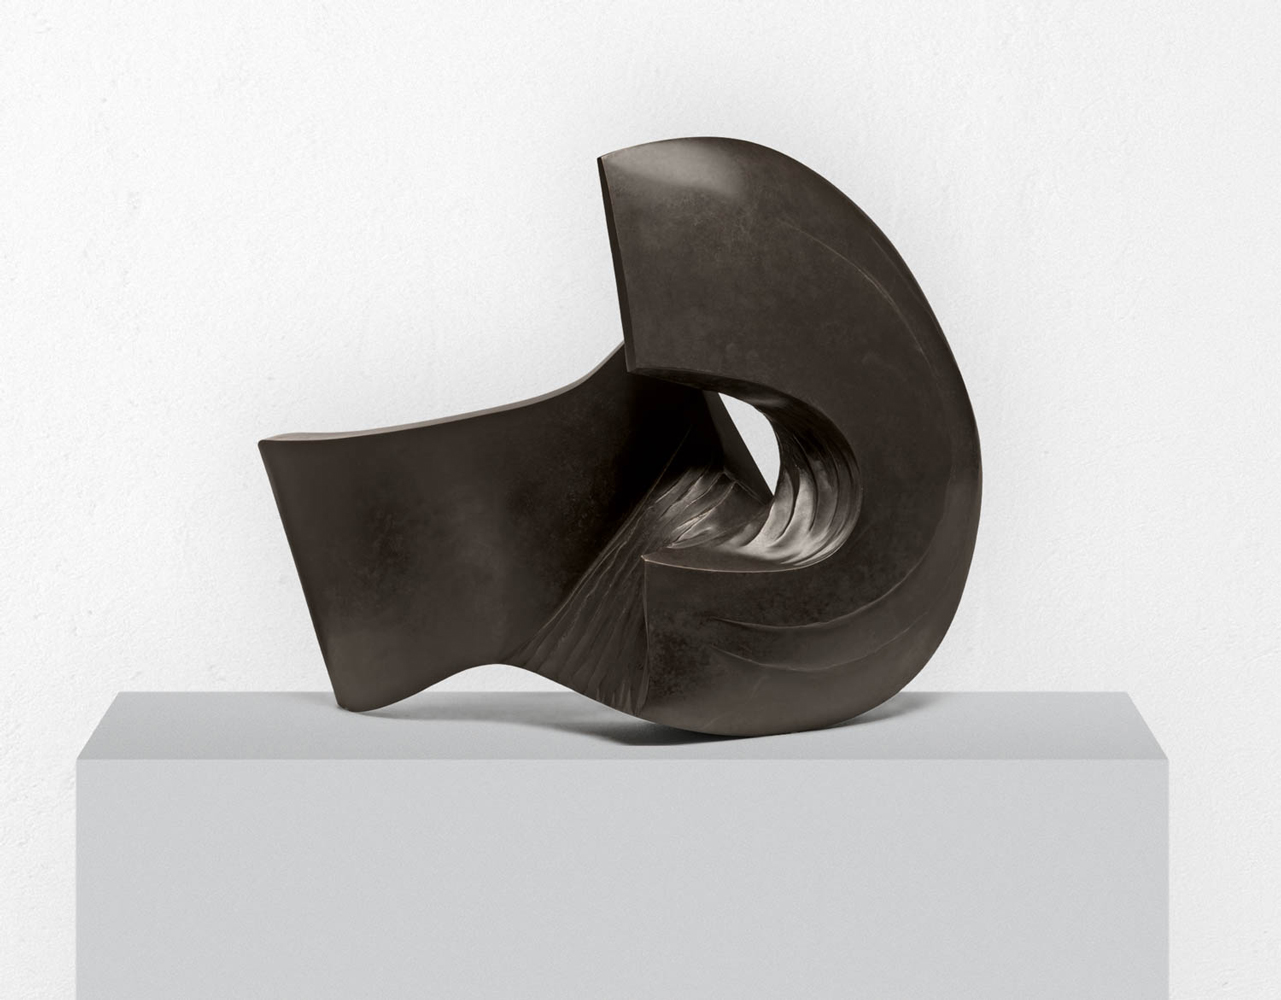 L'âme de fond 2, Bronze, 2012, 53 x 75 x 36 cm